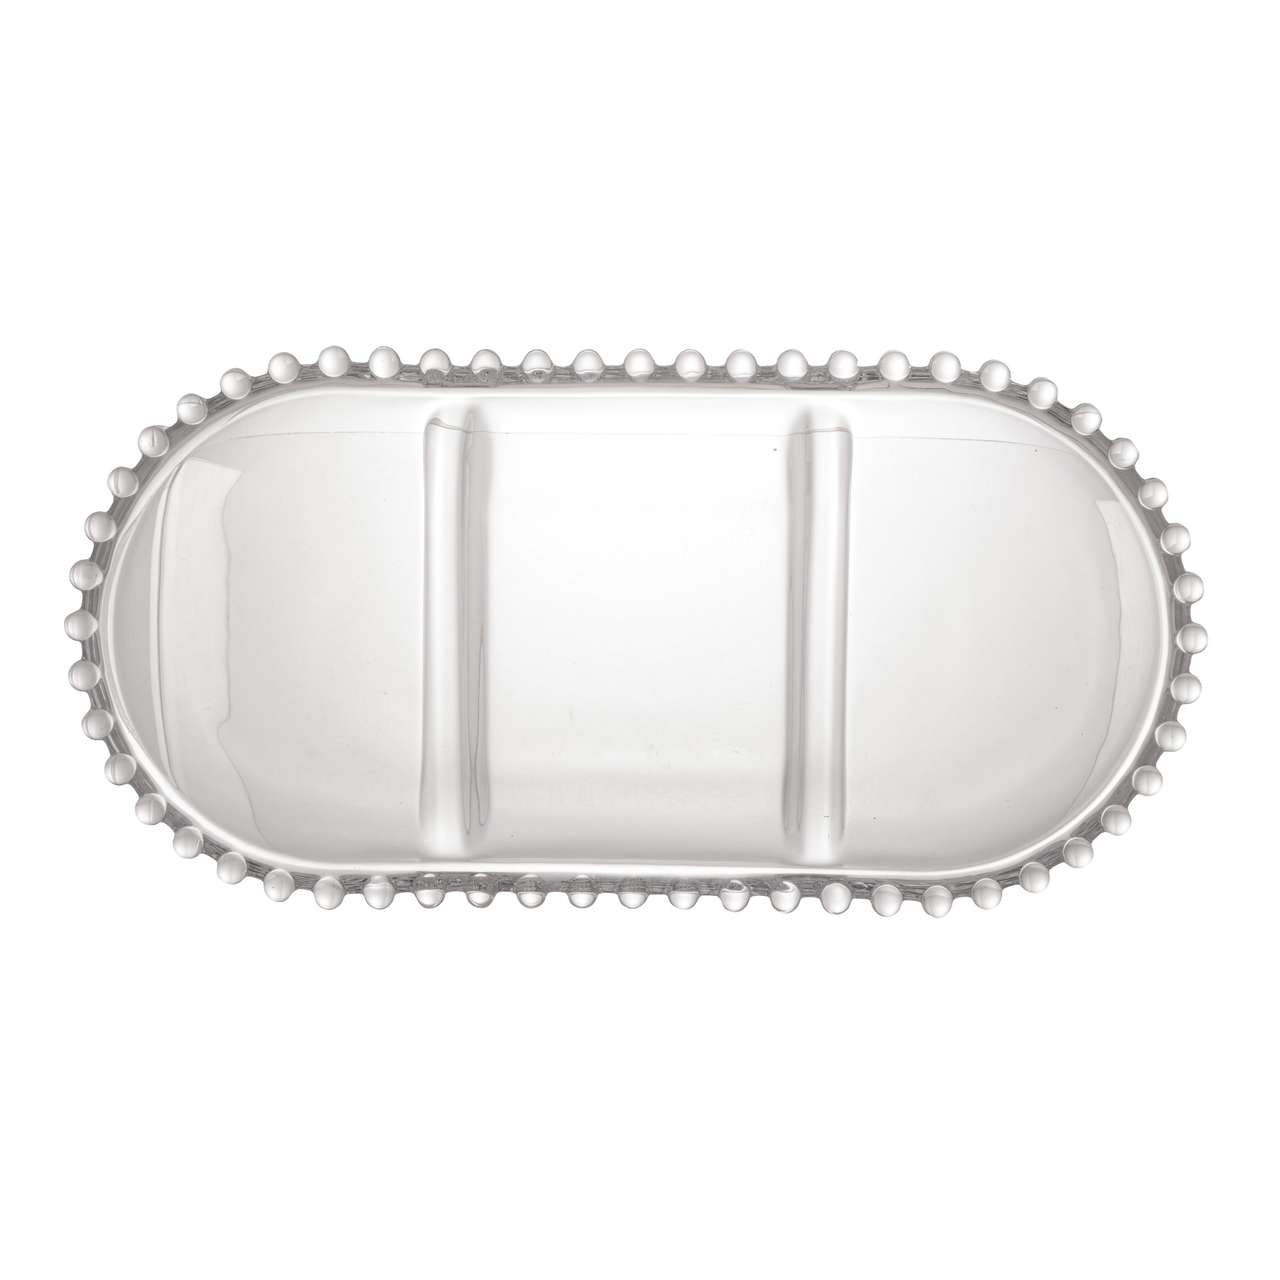 Petisqueira 30 cm de cristal com 3 divisões oval Pearl Wolff - 28385